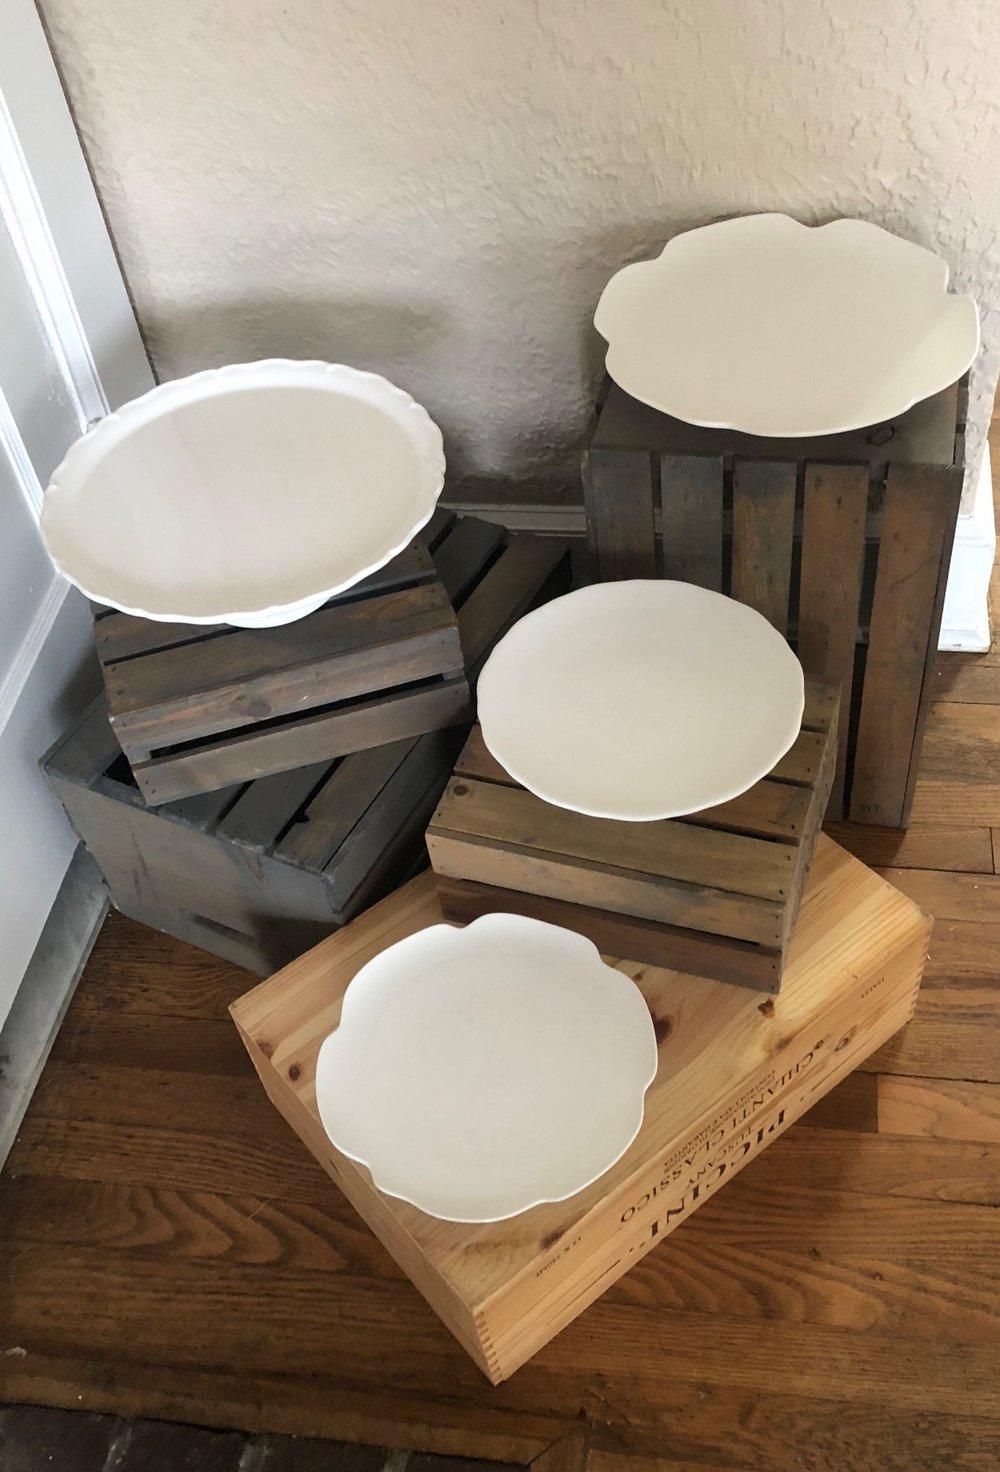 - (Top view of ceramic cake plates)